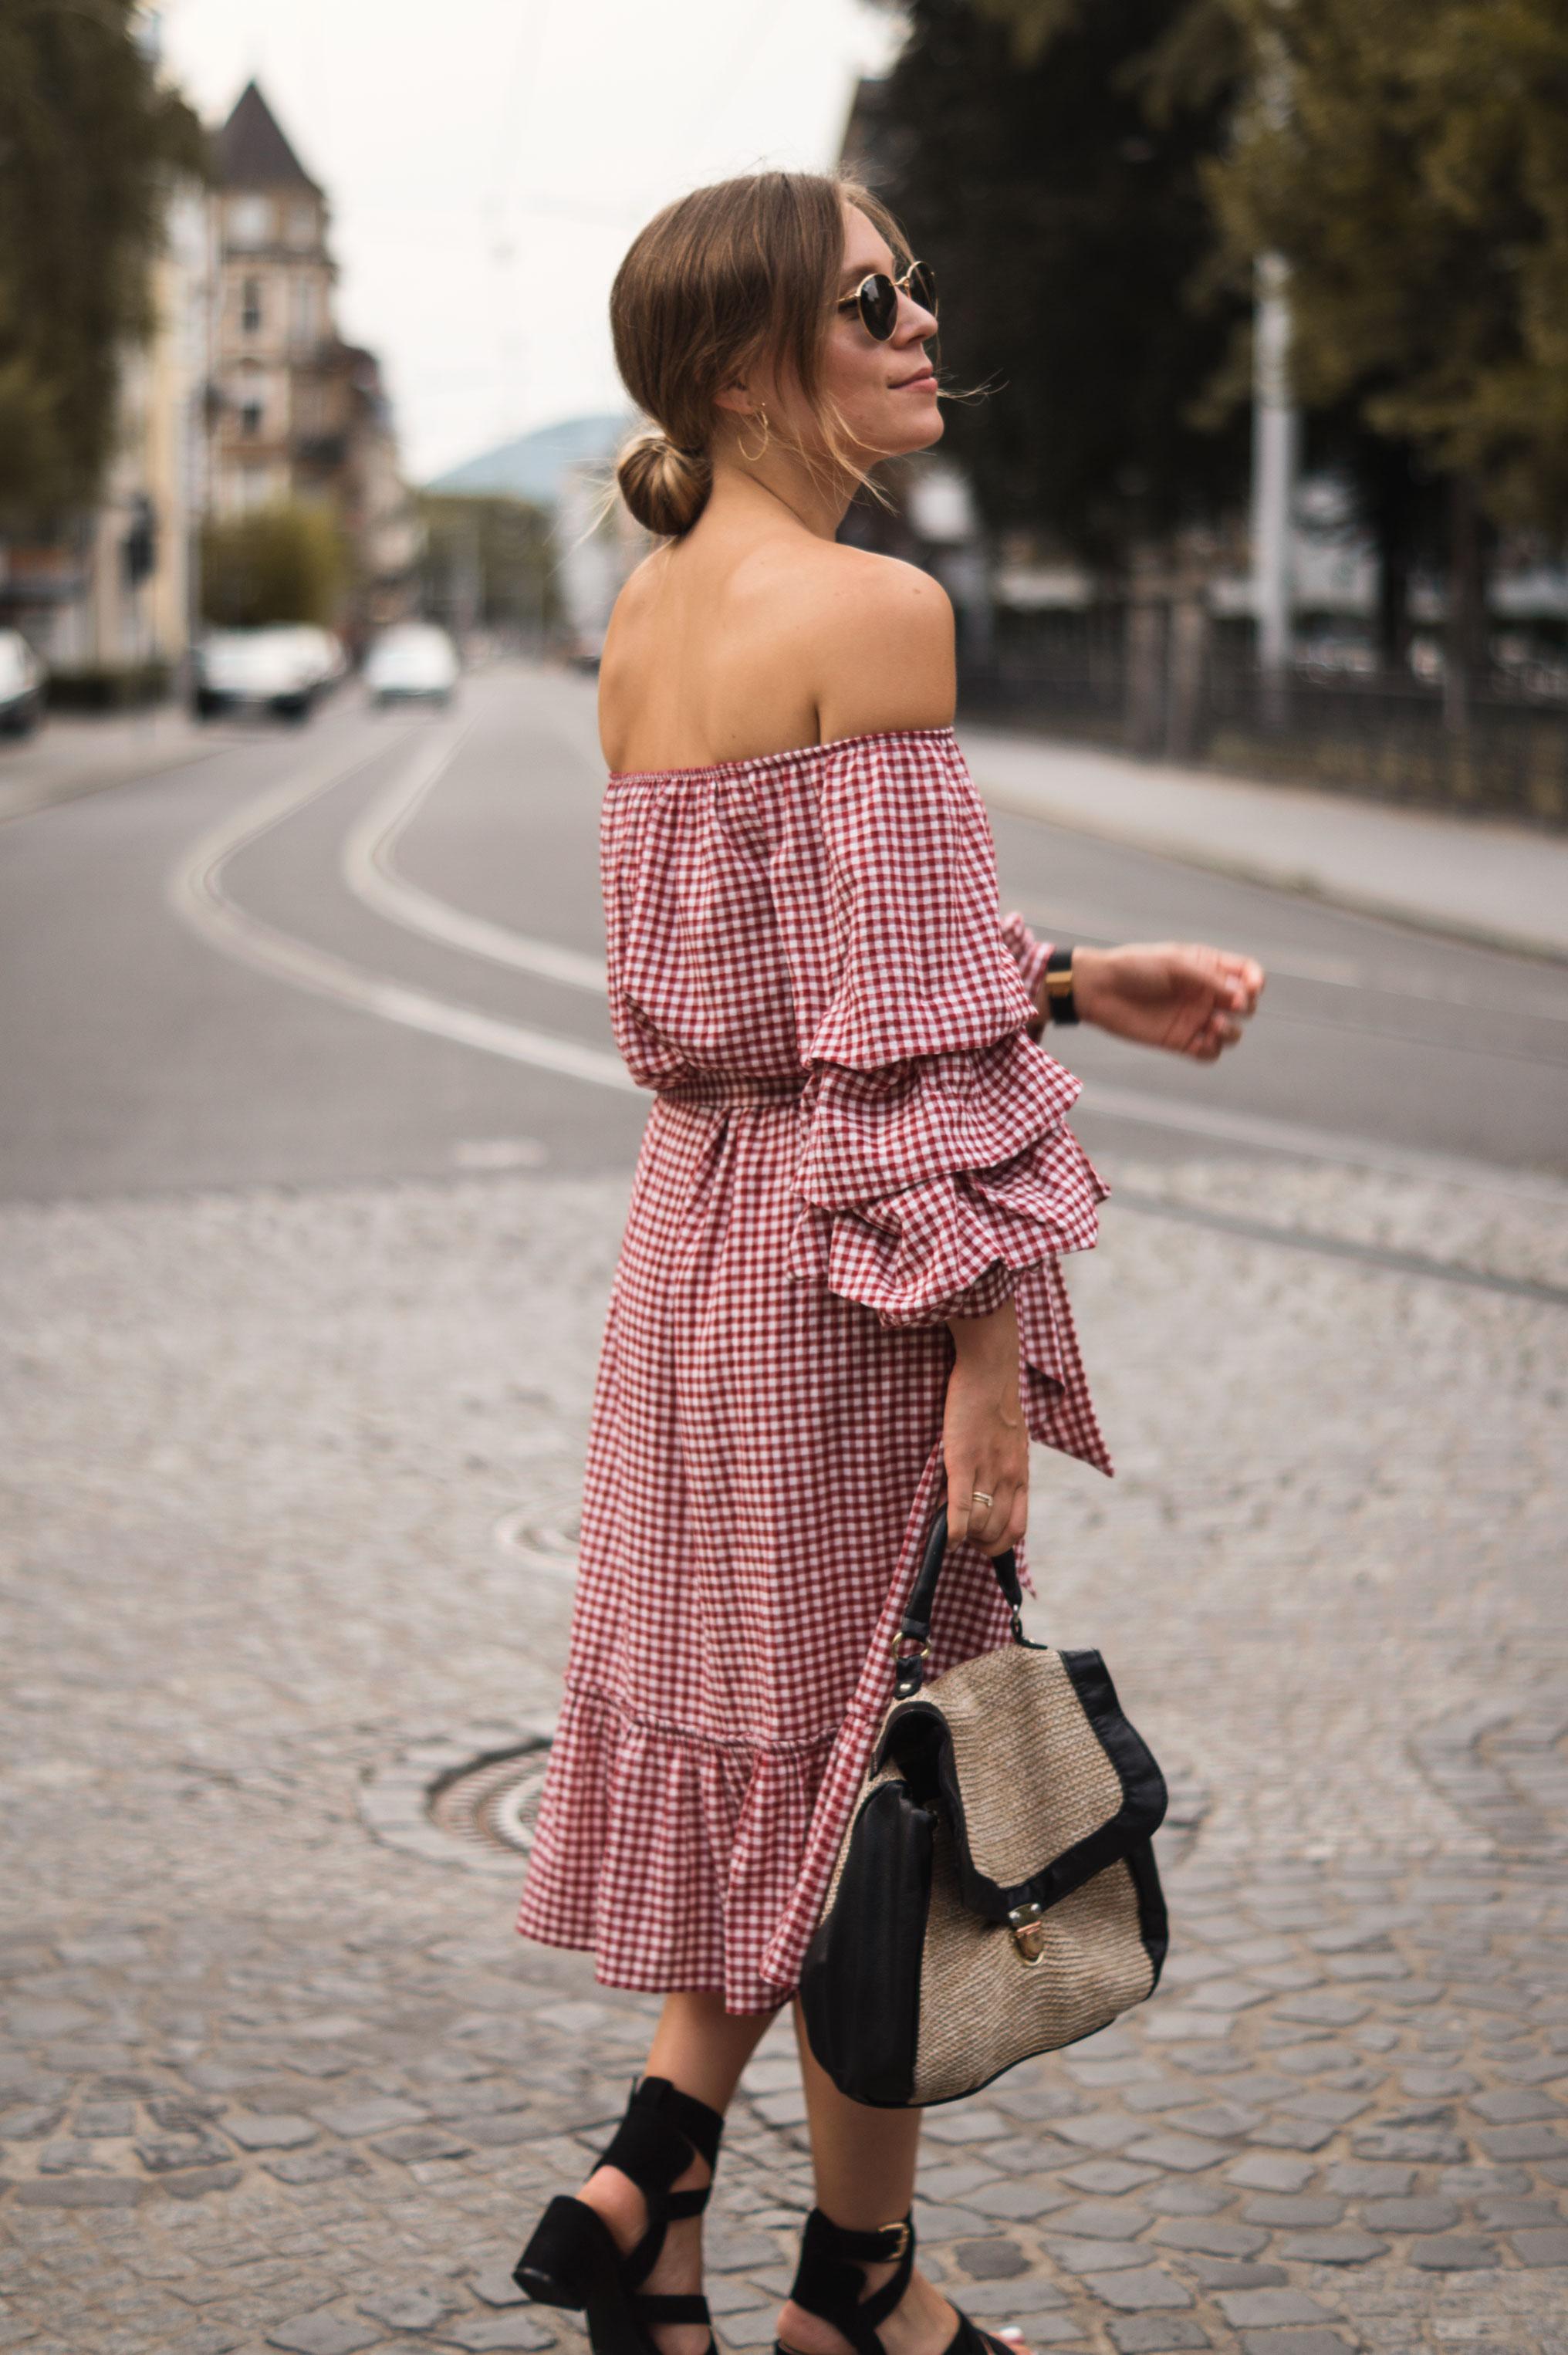 rotes Karokleid Zara off shoulder gingham Streetstyle Heidelberg Sariety Modeblog Fashionblogger-8